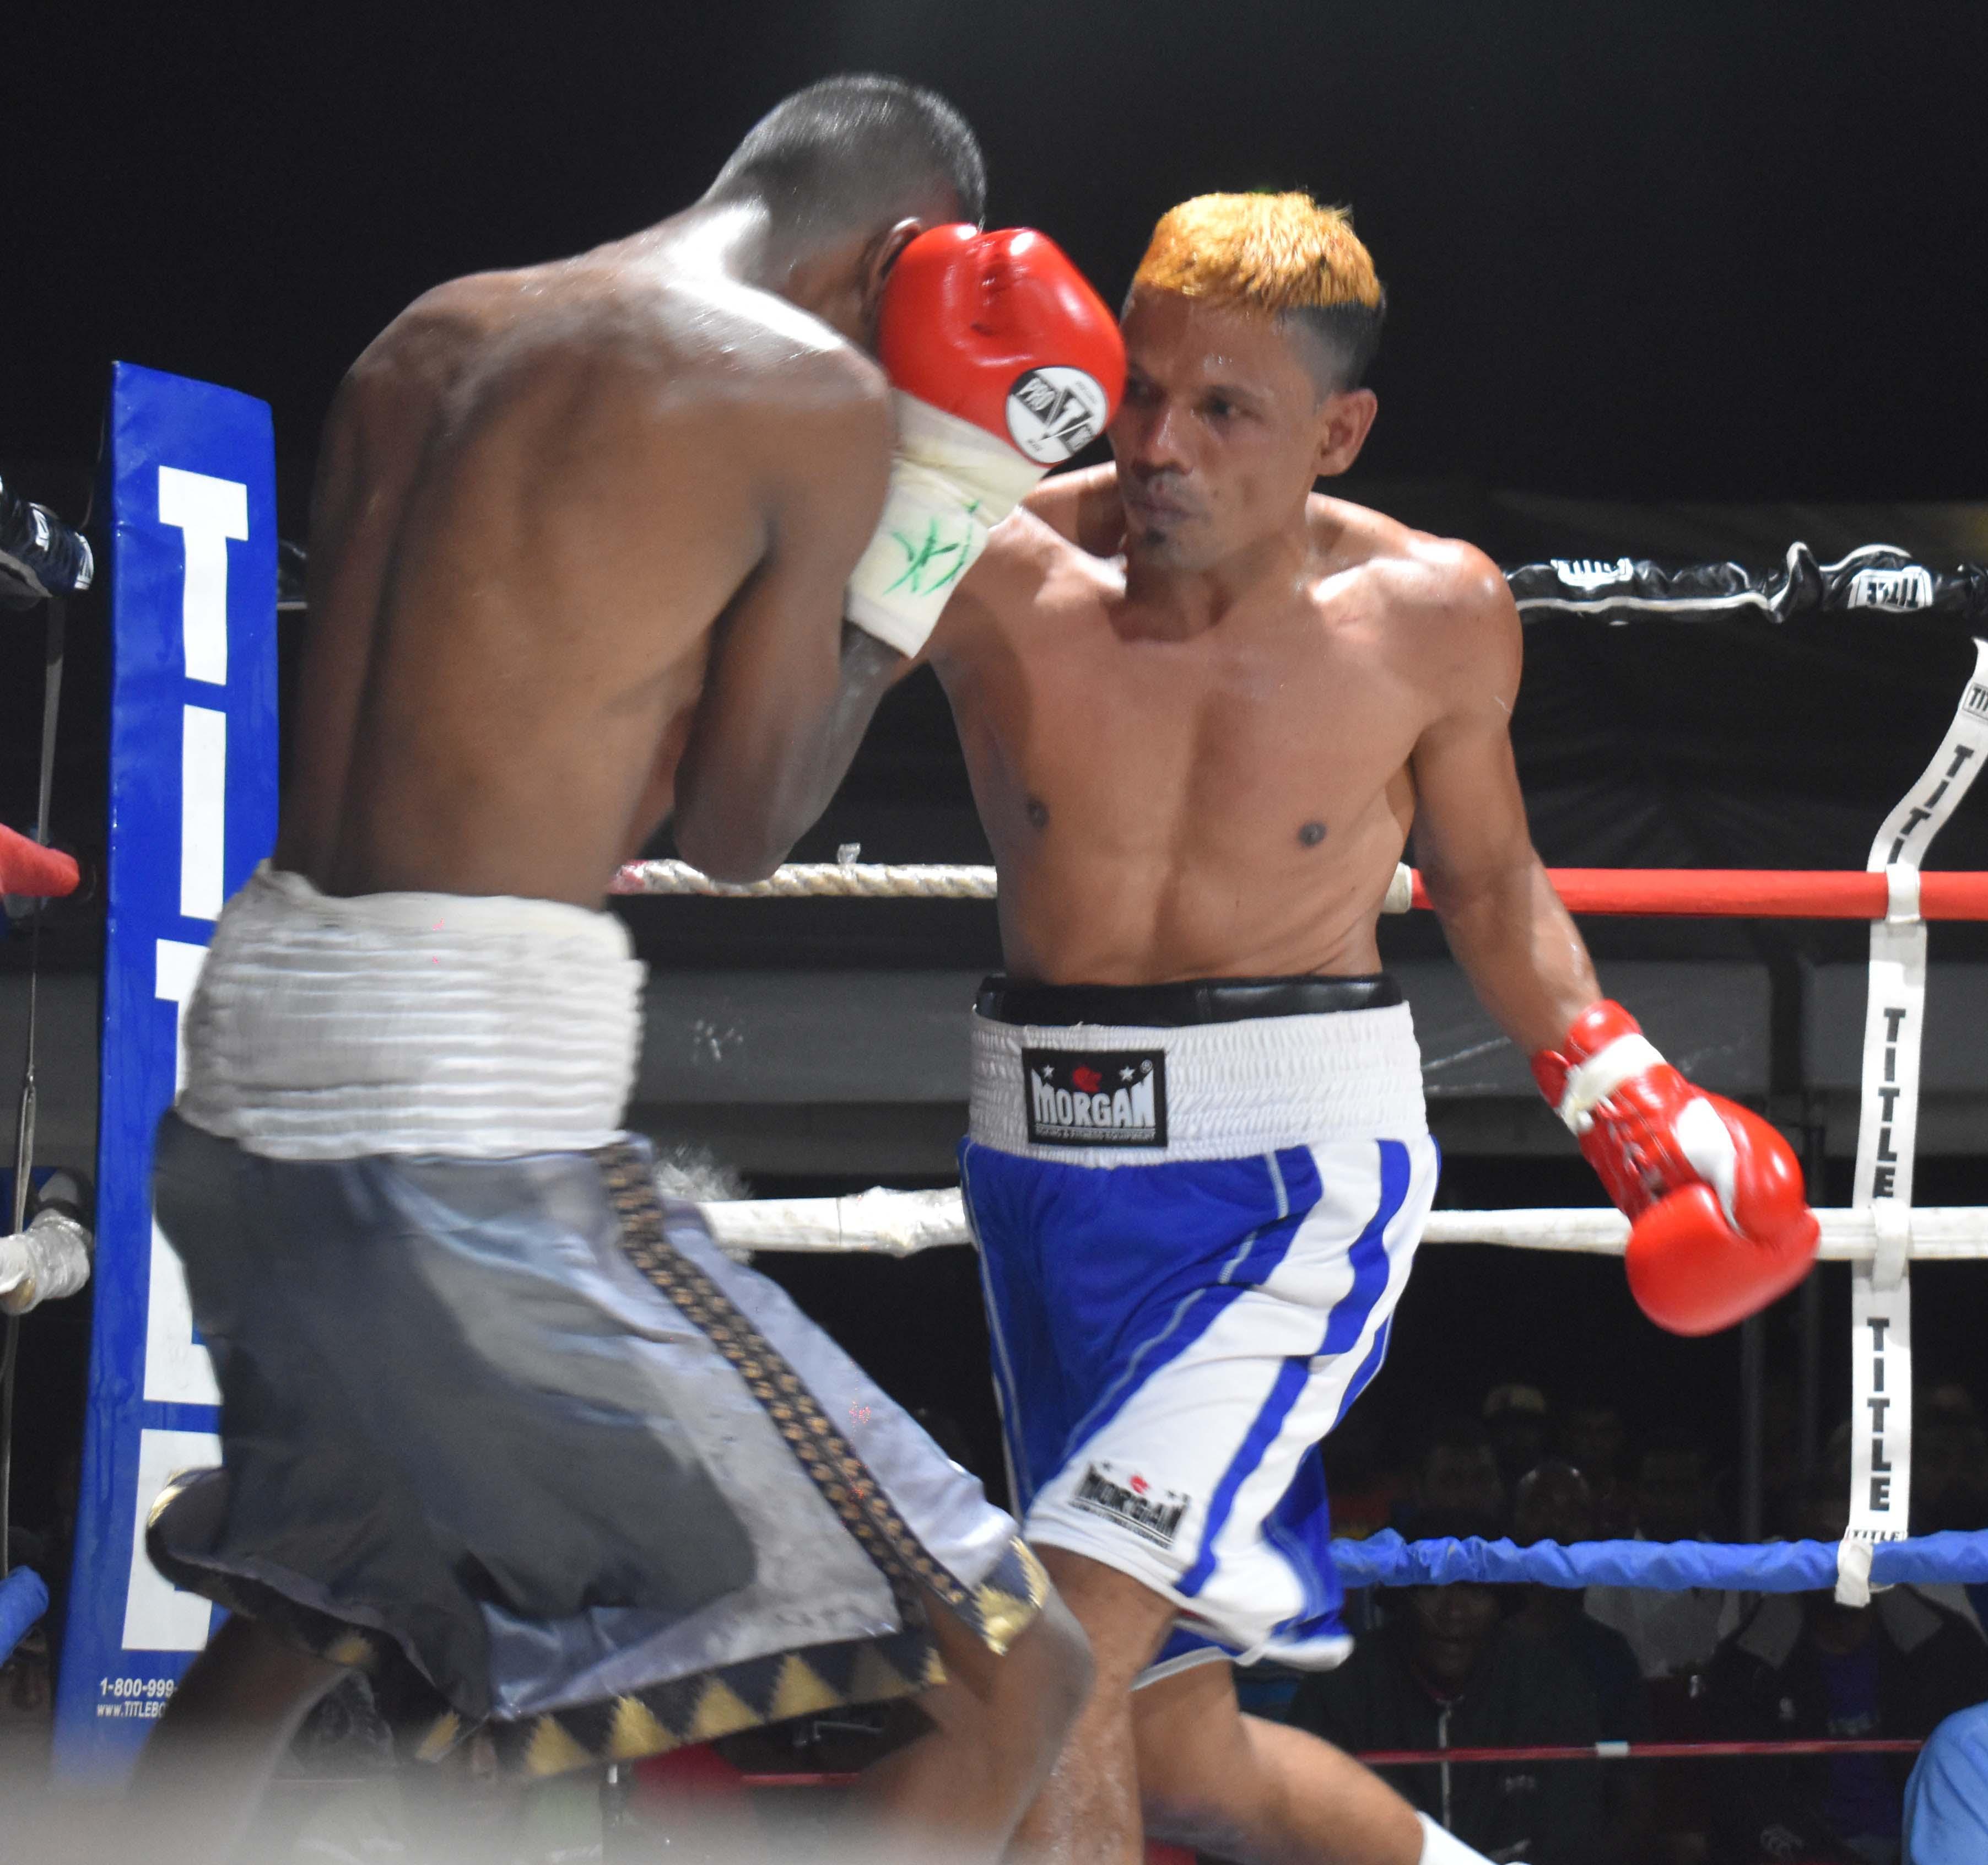 Krishneel Mudaliar blocks junior Farzan in the boxing programe at the Prince Charles Park in Nadi last night. Photo: WAISEA NASOKIA